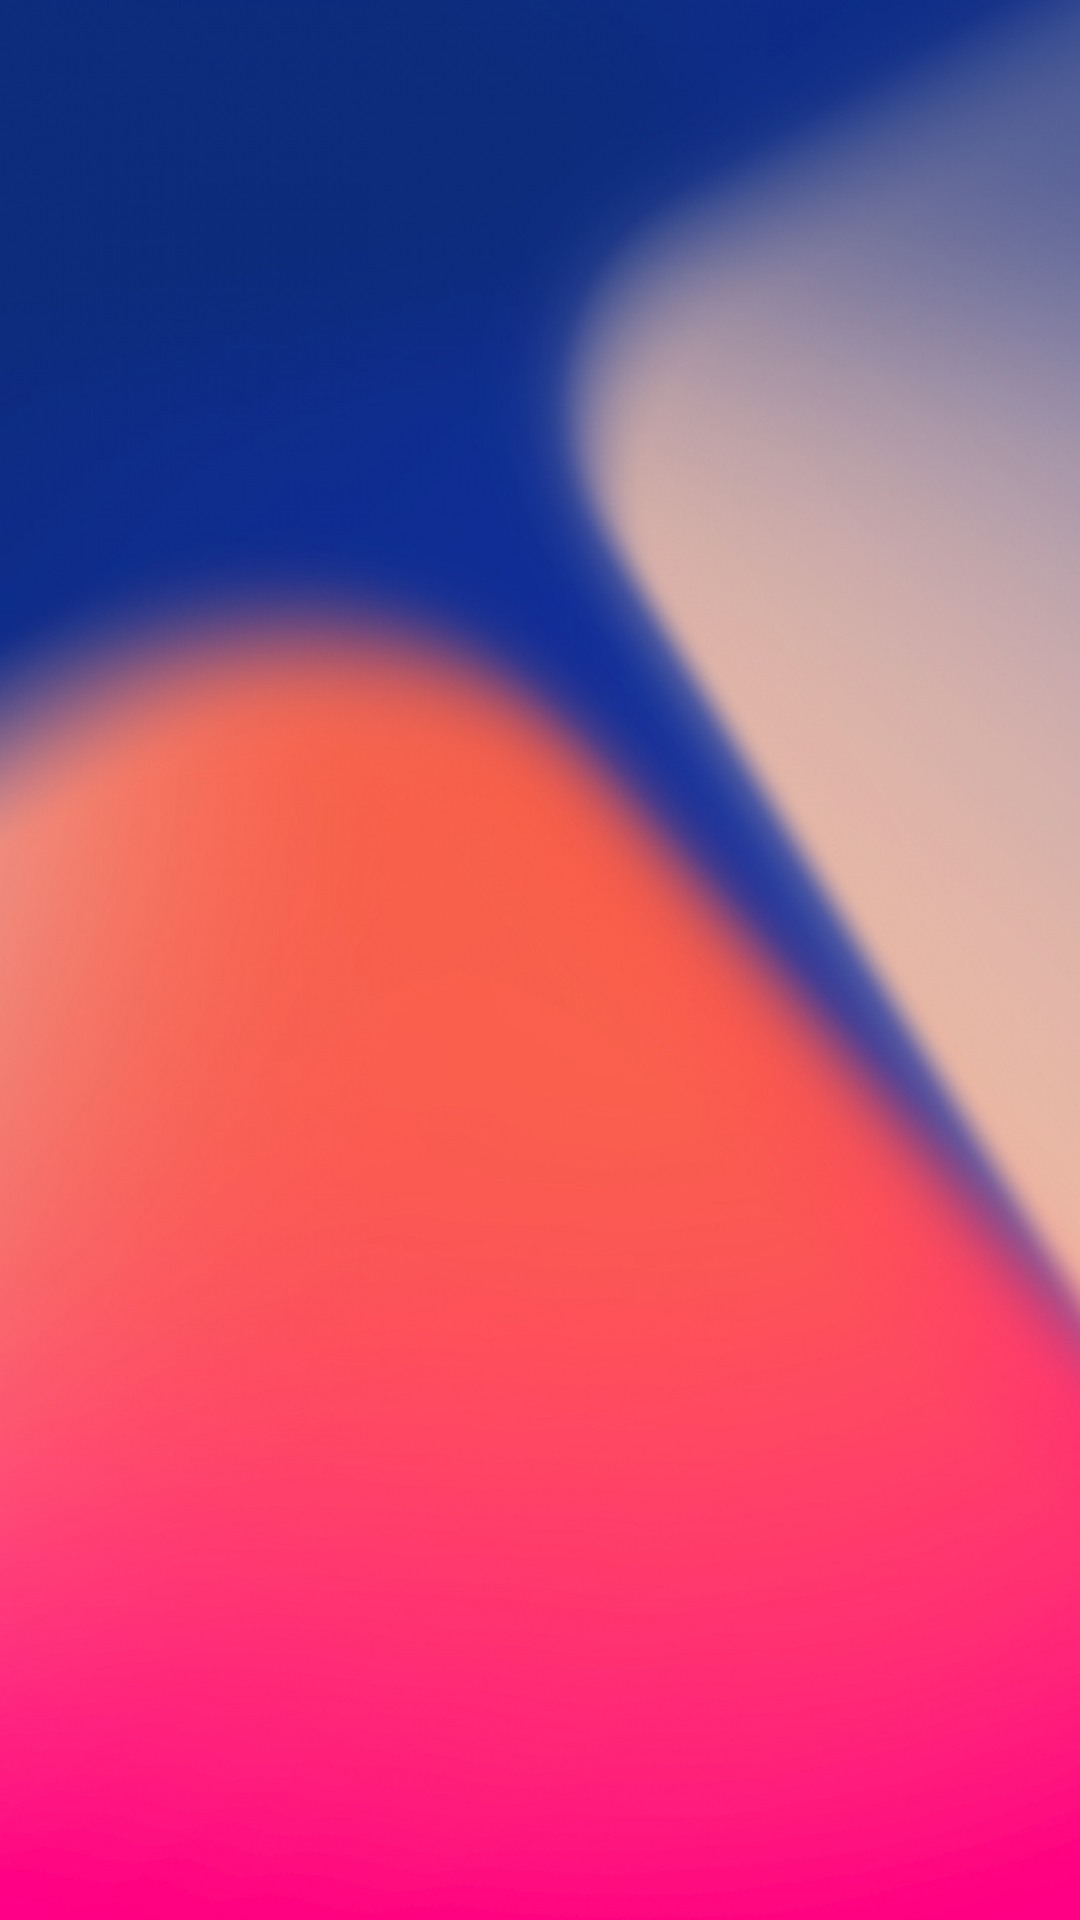 Apple Event Blur iPhone Wallpaper